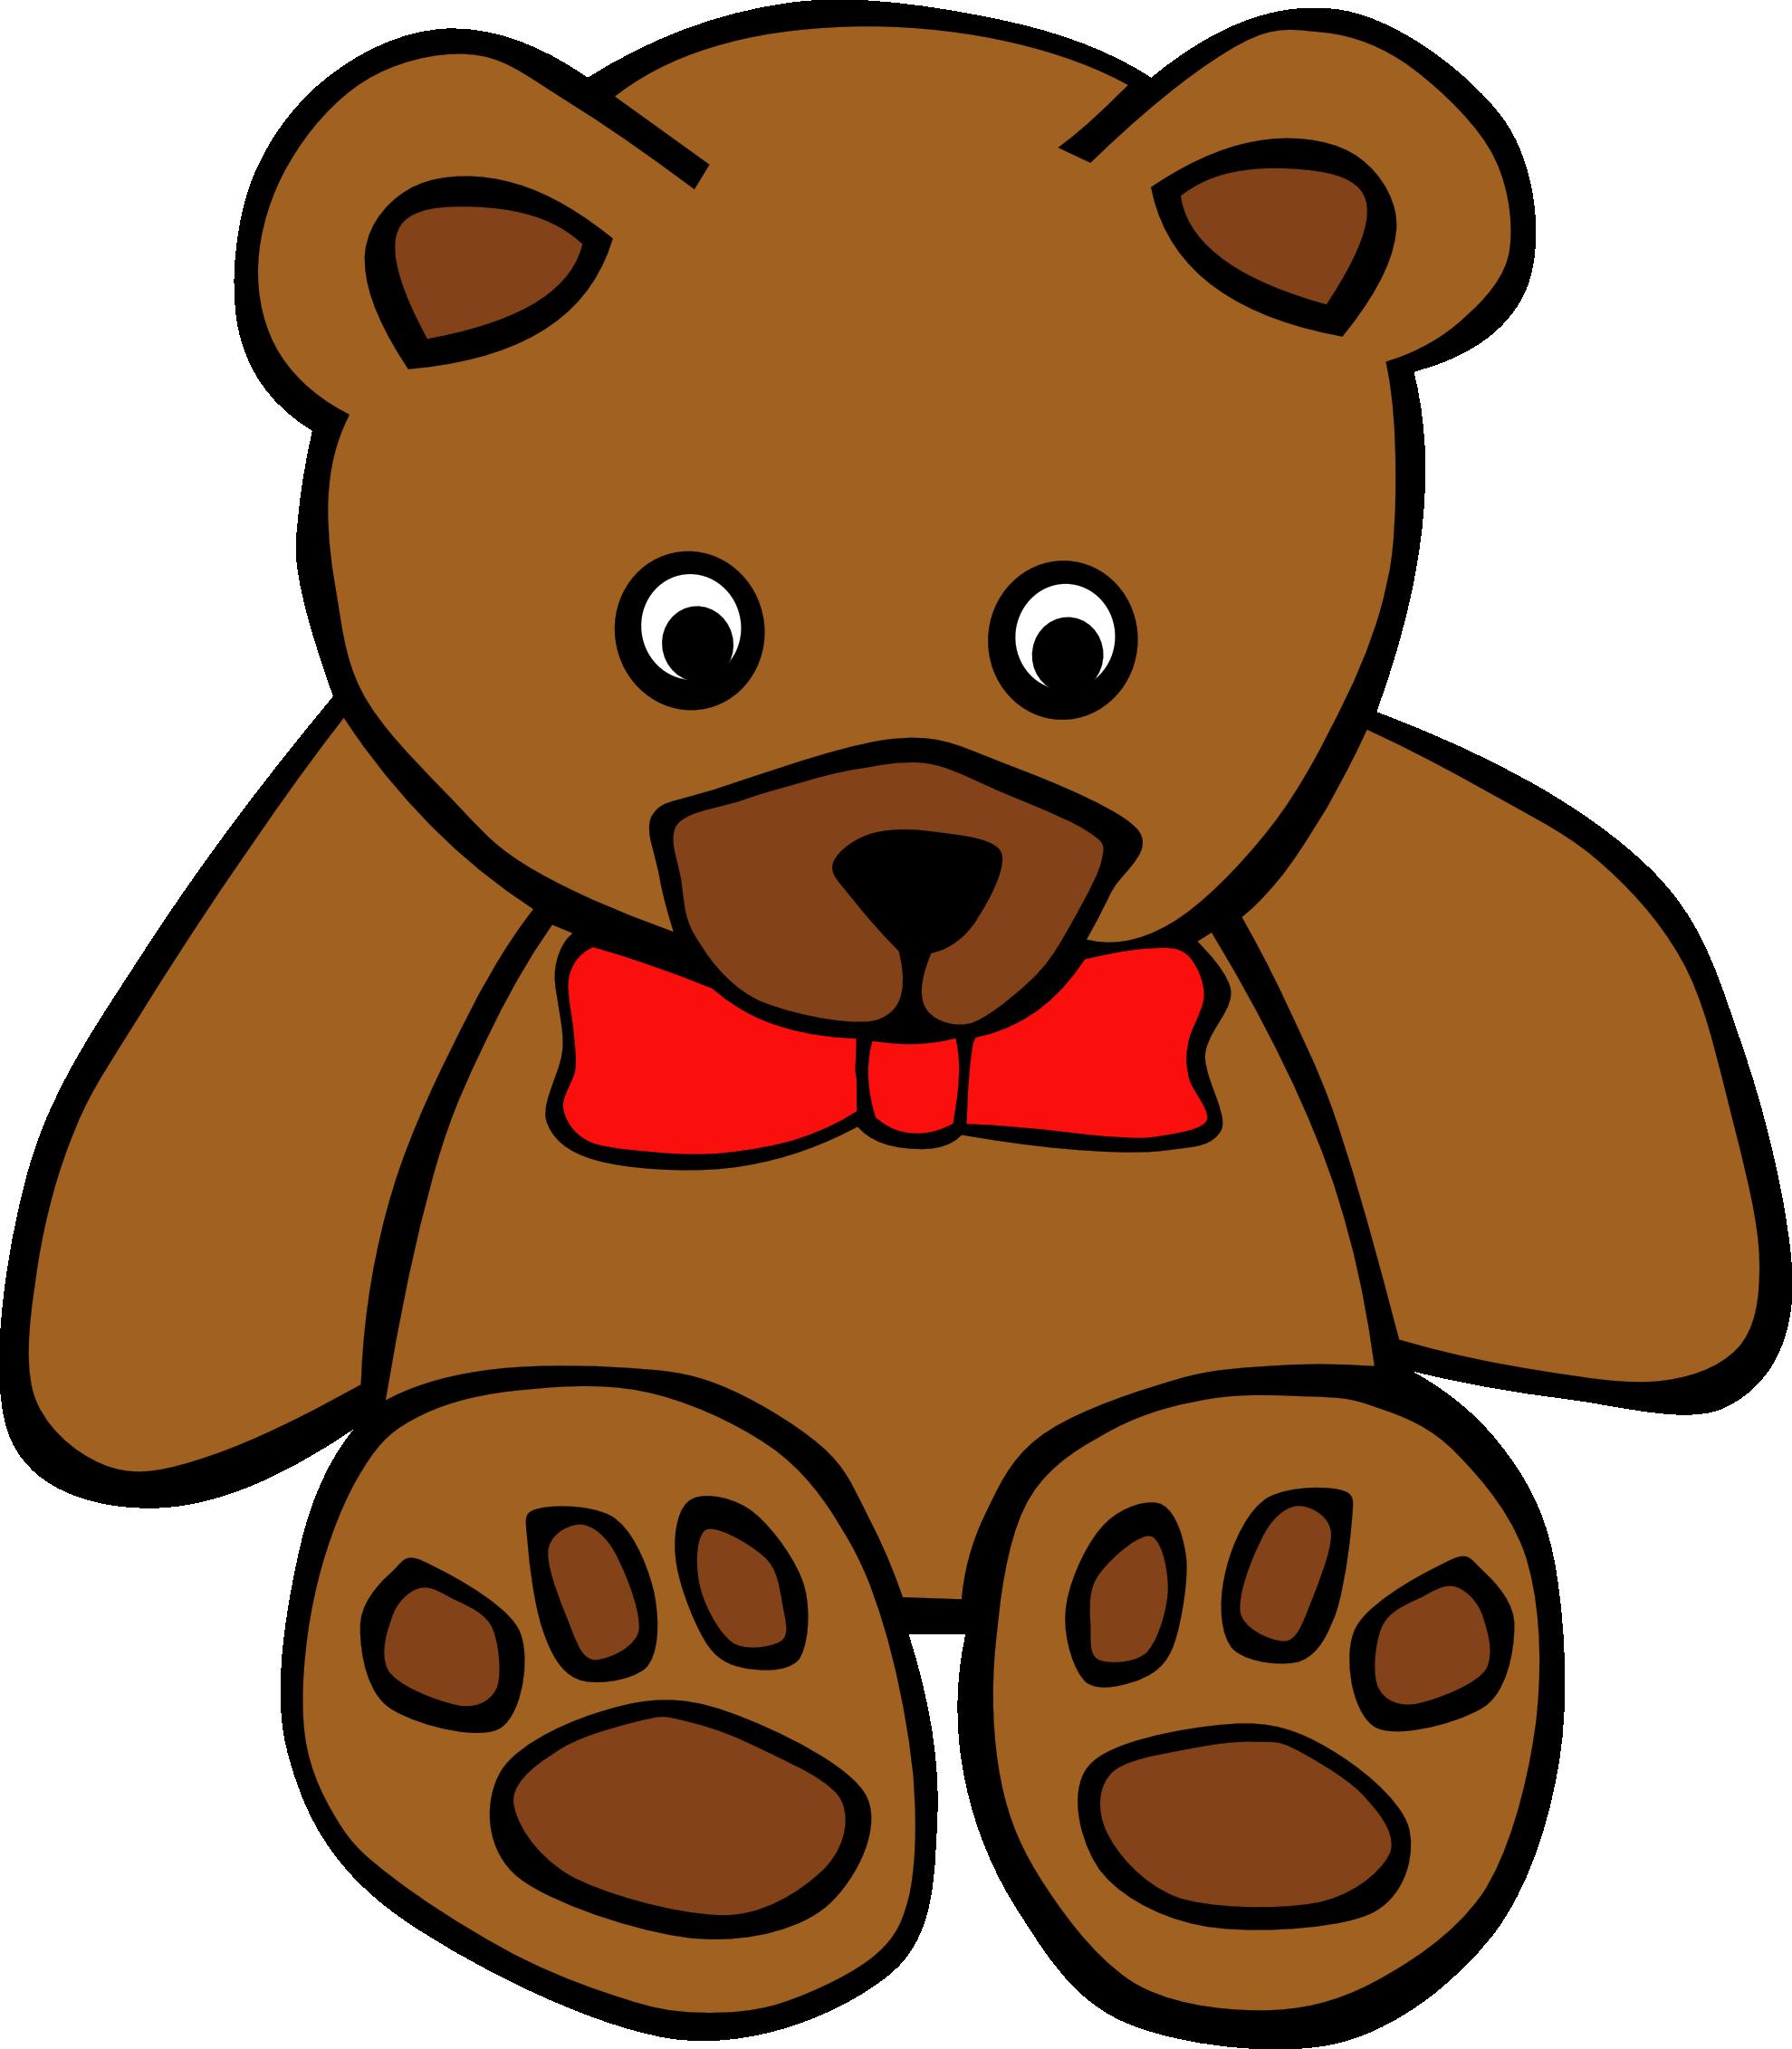 svg transparent download Clip art . Teddy bear clipart images